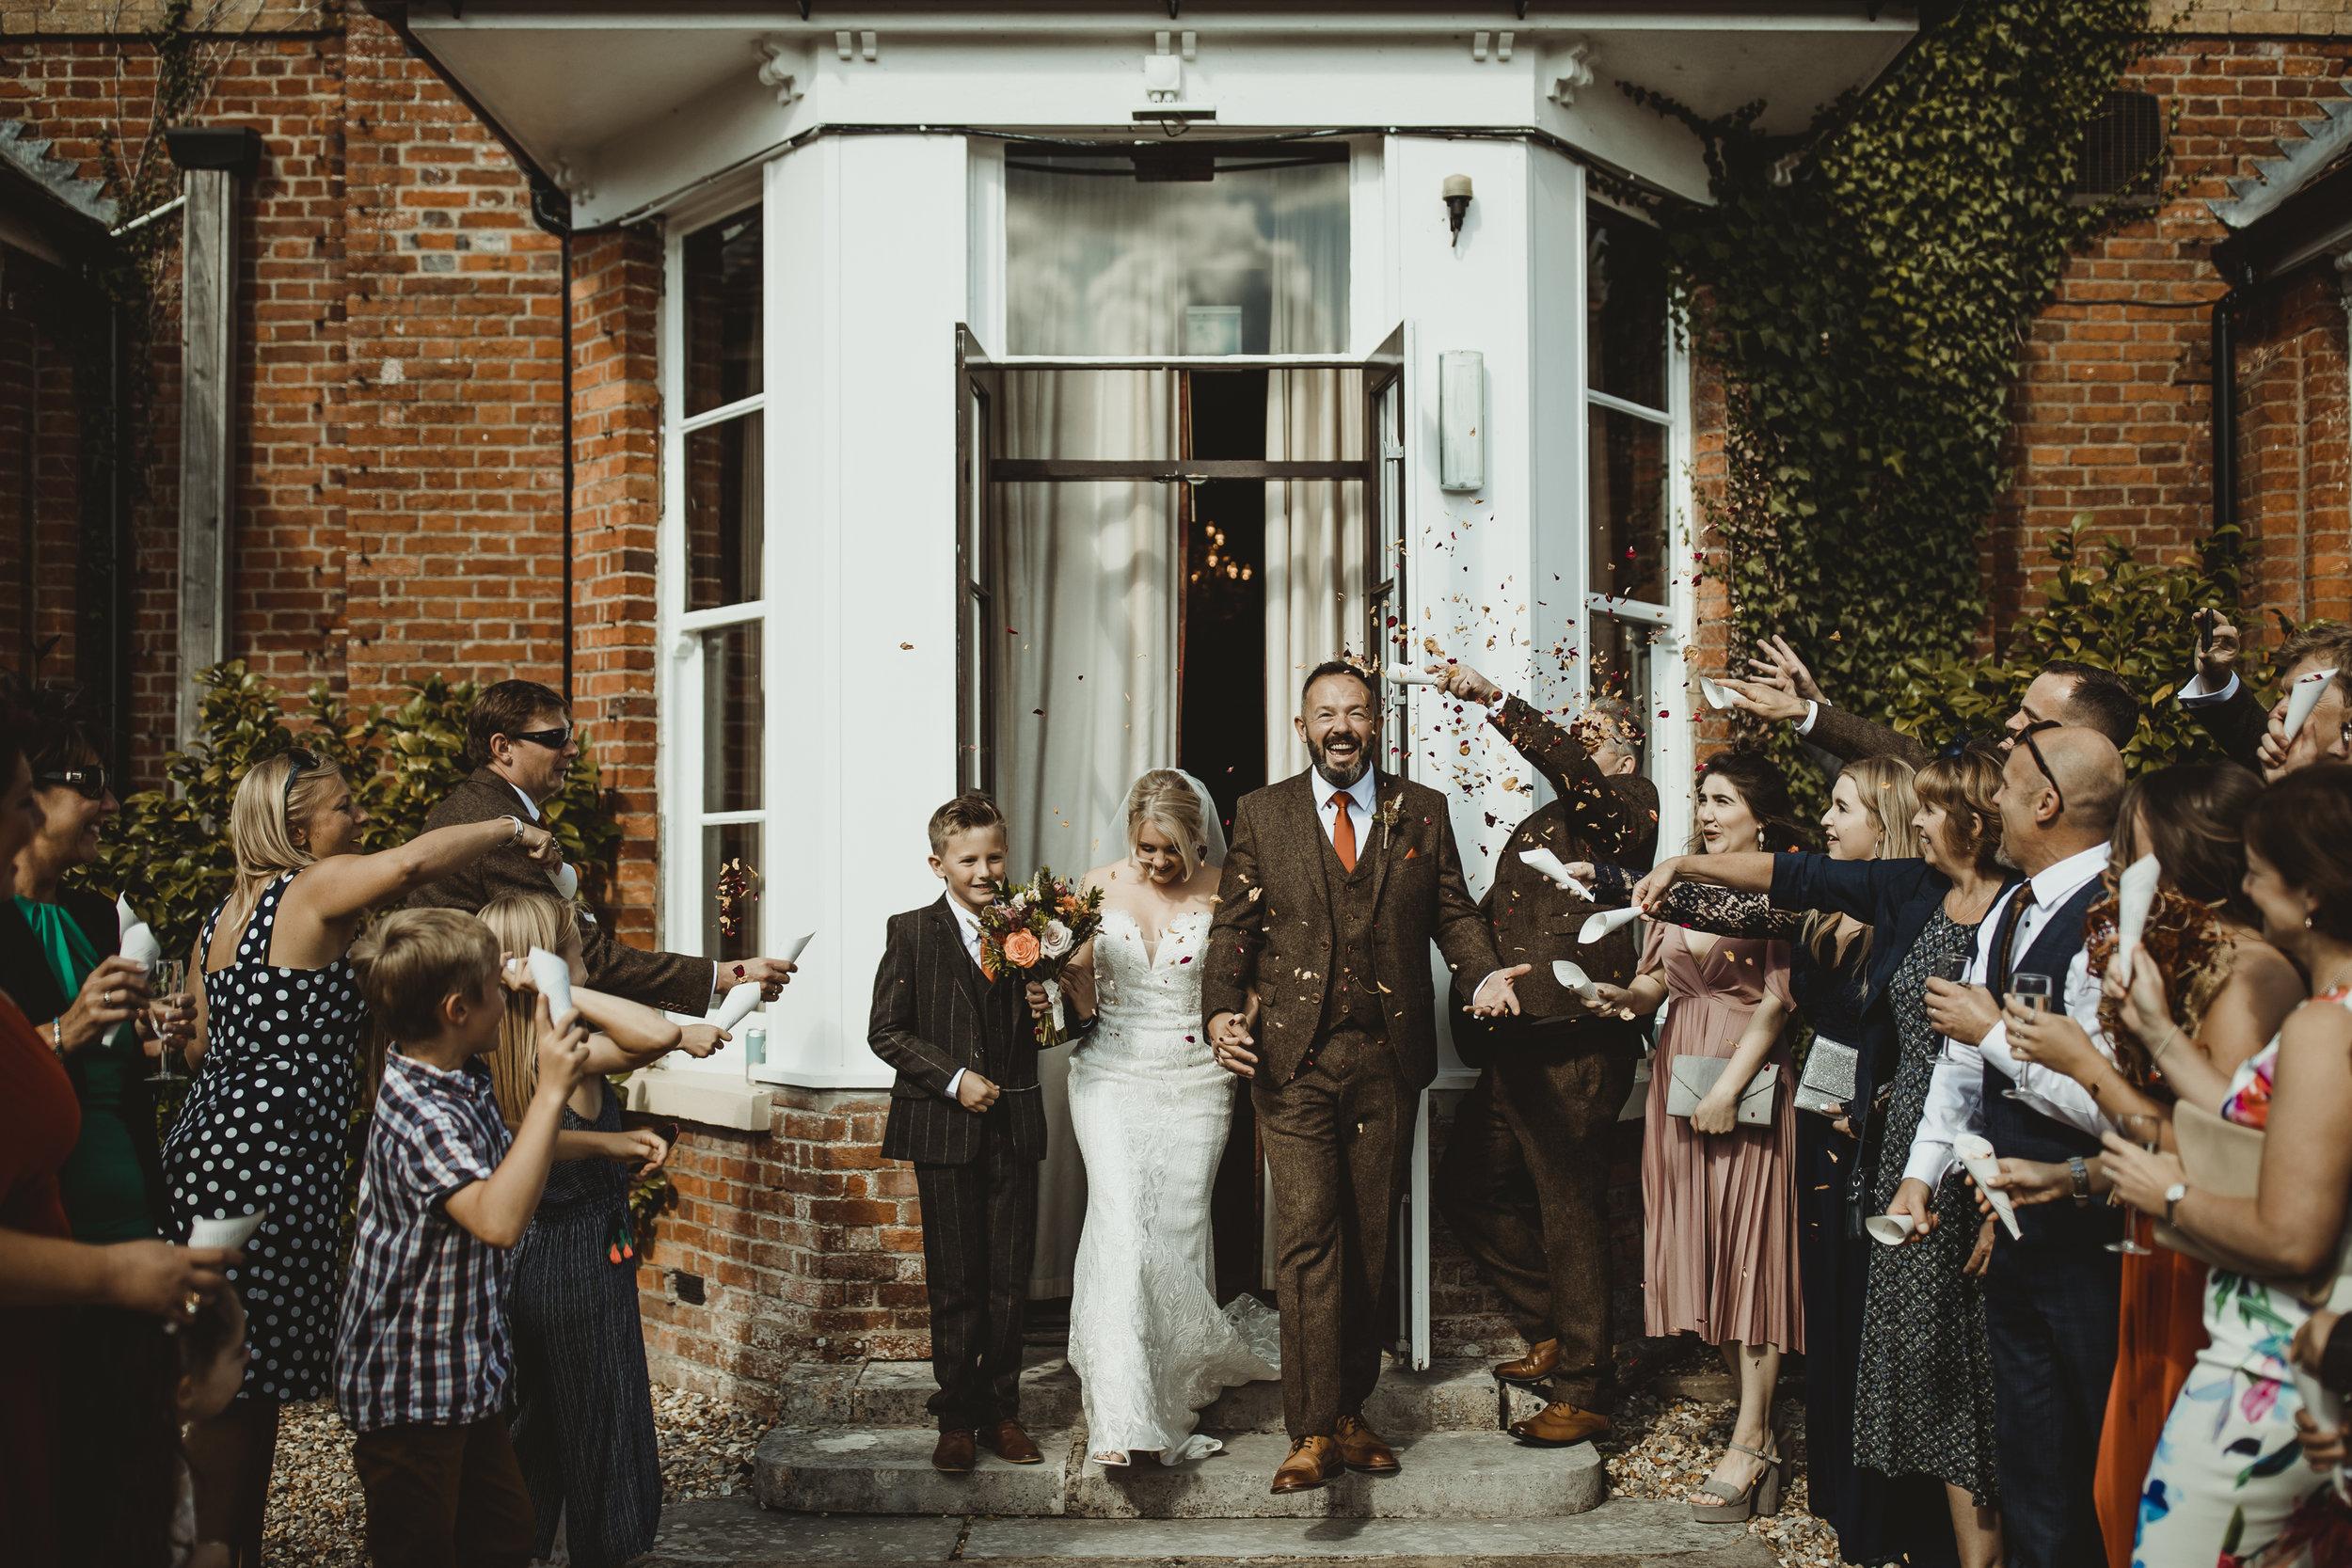 A&E_HampshireWedding_Photographer_Yorkshire_London-5.JPG